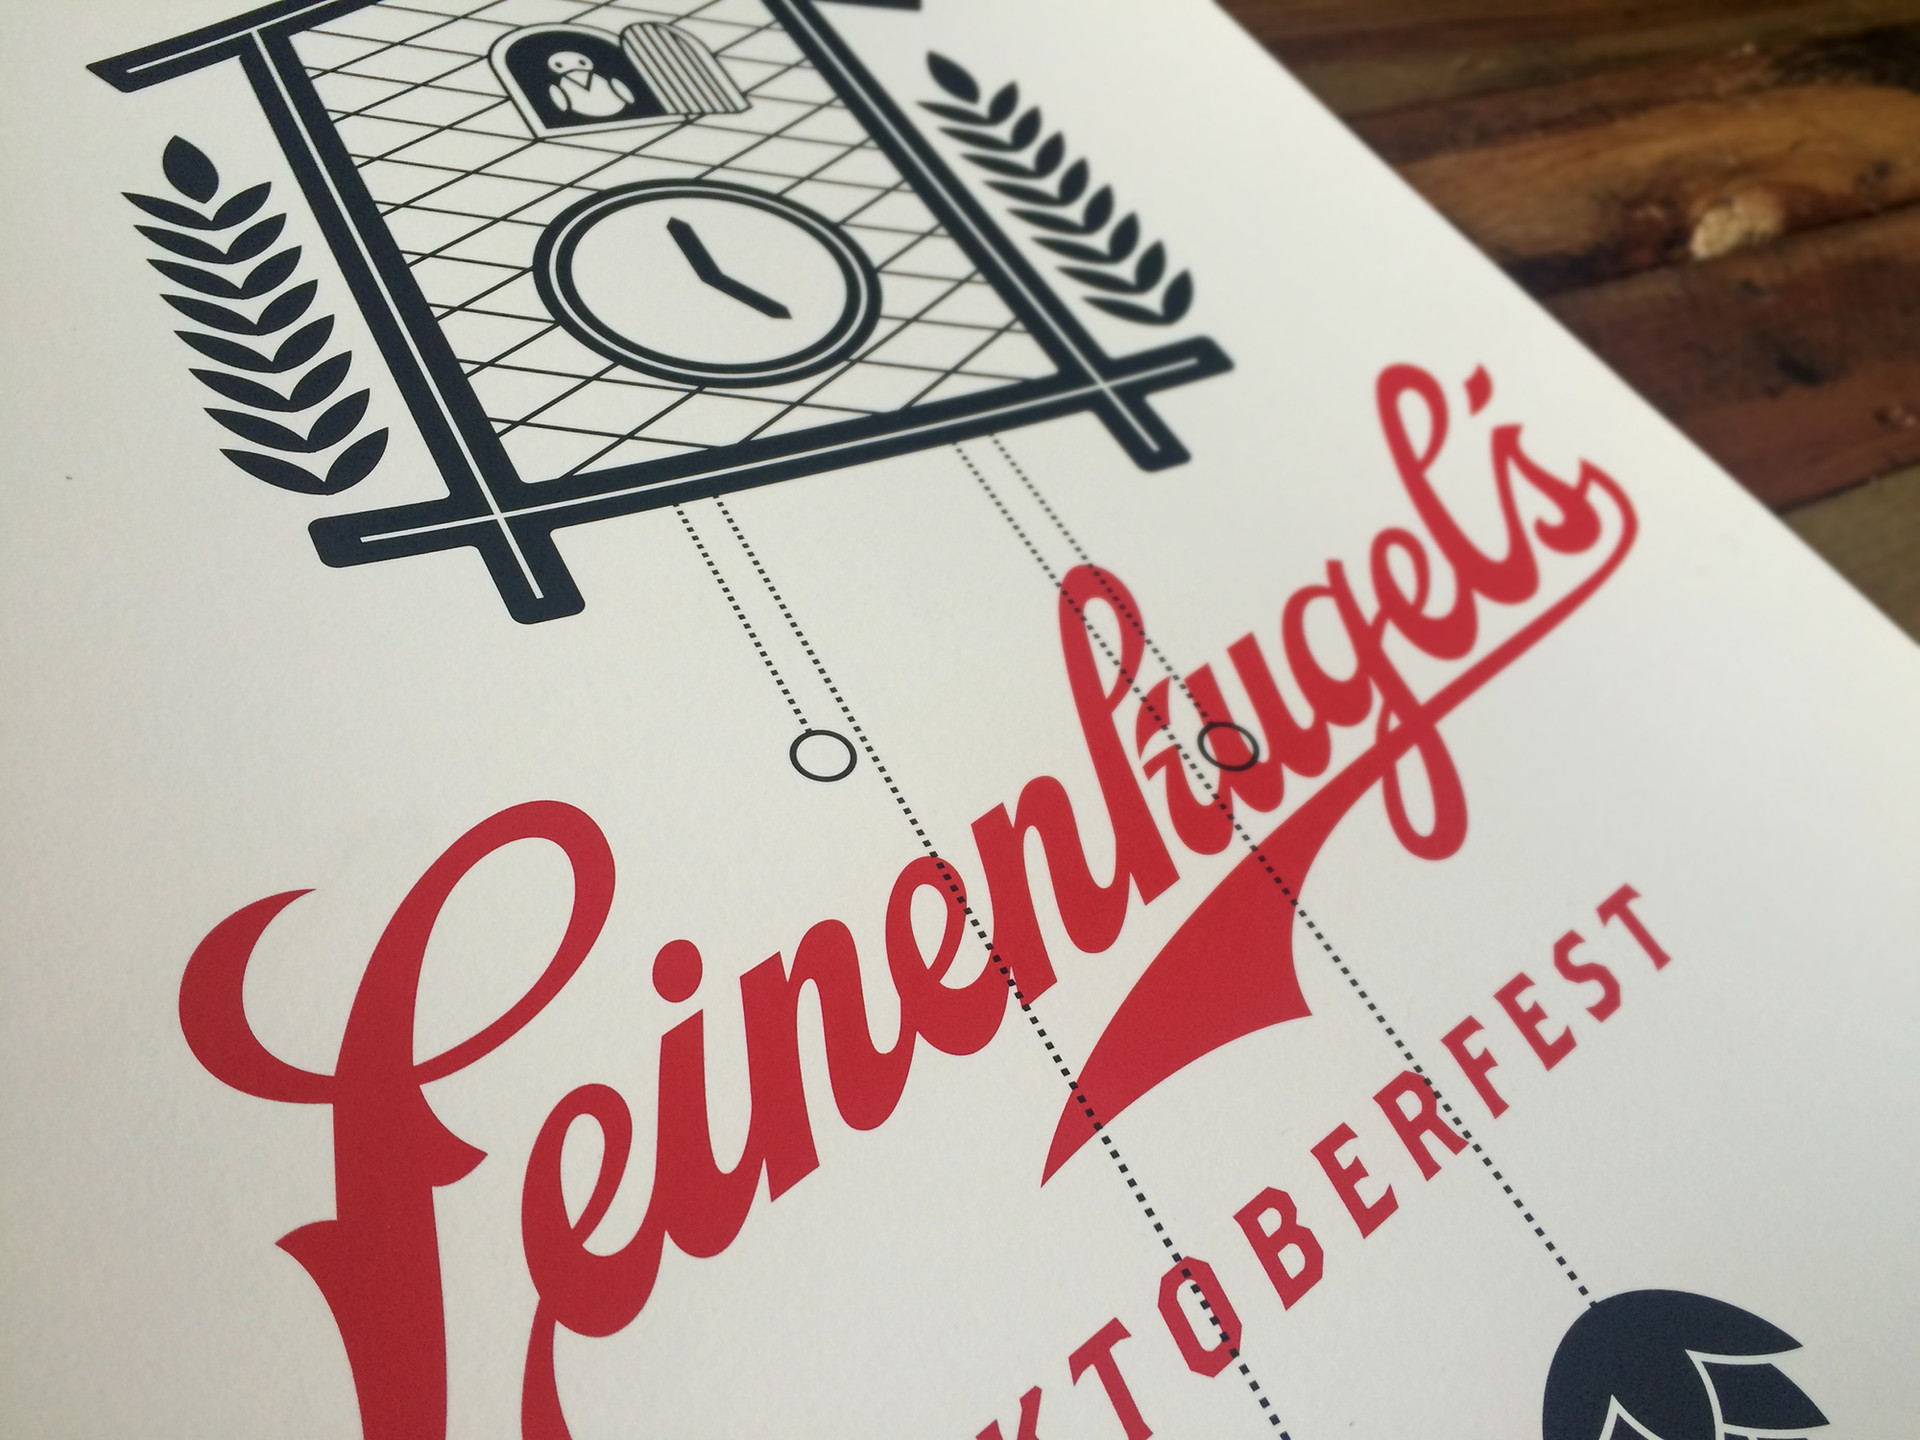 Linenkugel's Oktoberfest | Erickson Design Co.